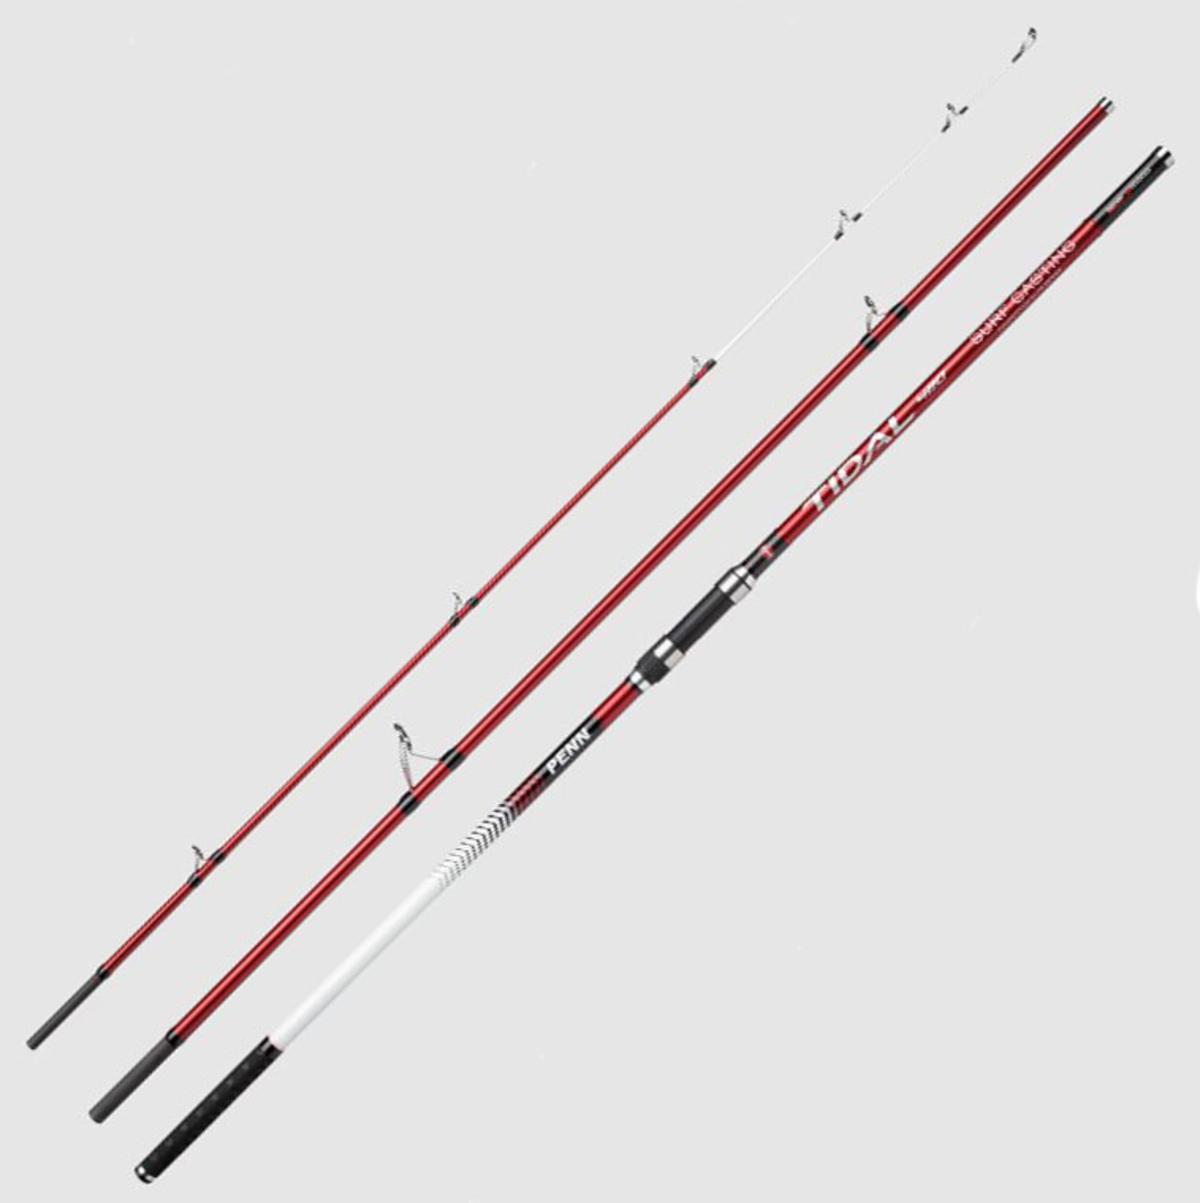 New Penn Tidal Surfcasting Beach Fishing Rod - 14ft / 50-200g / 3pc - 1541068